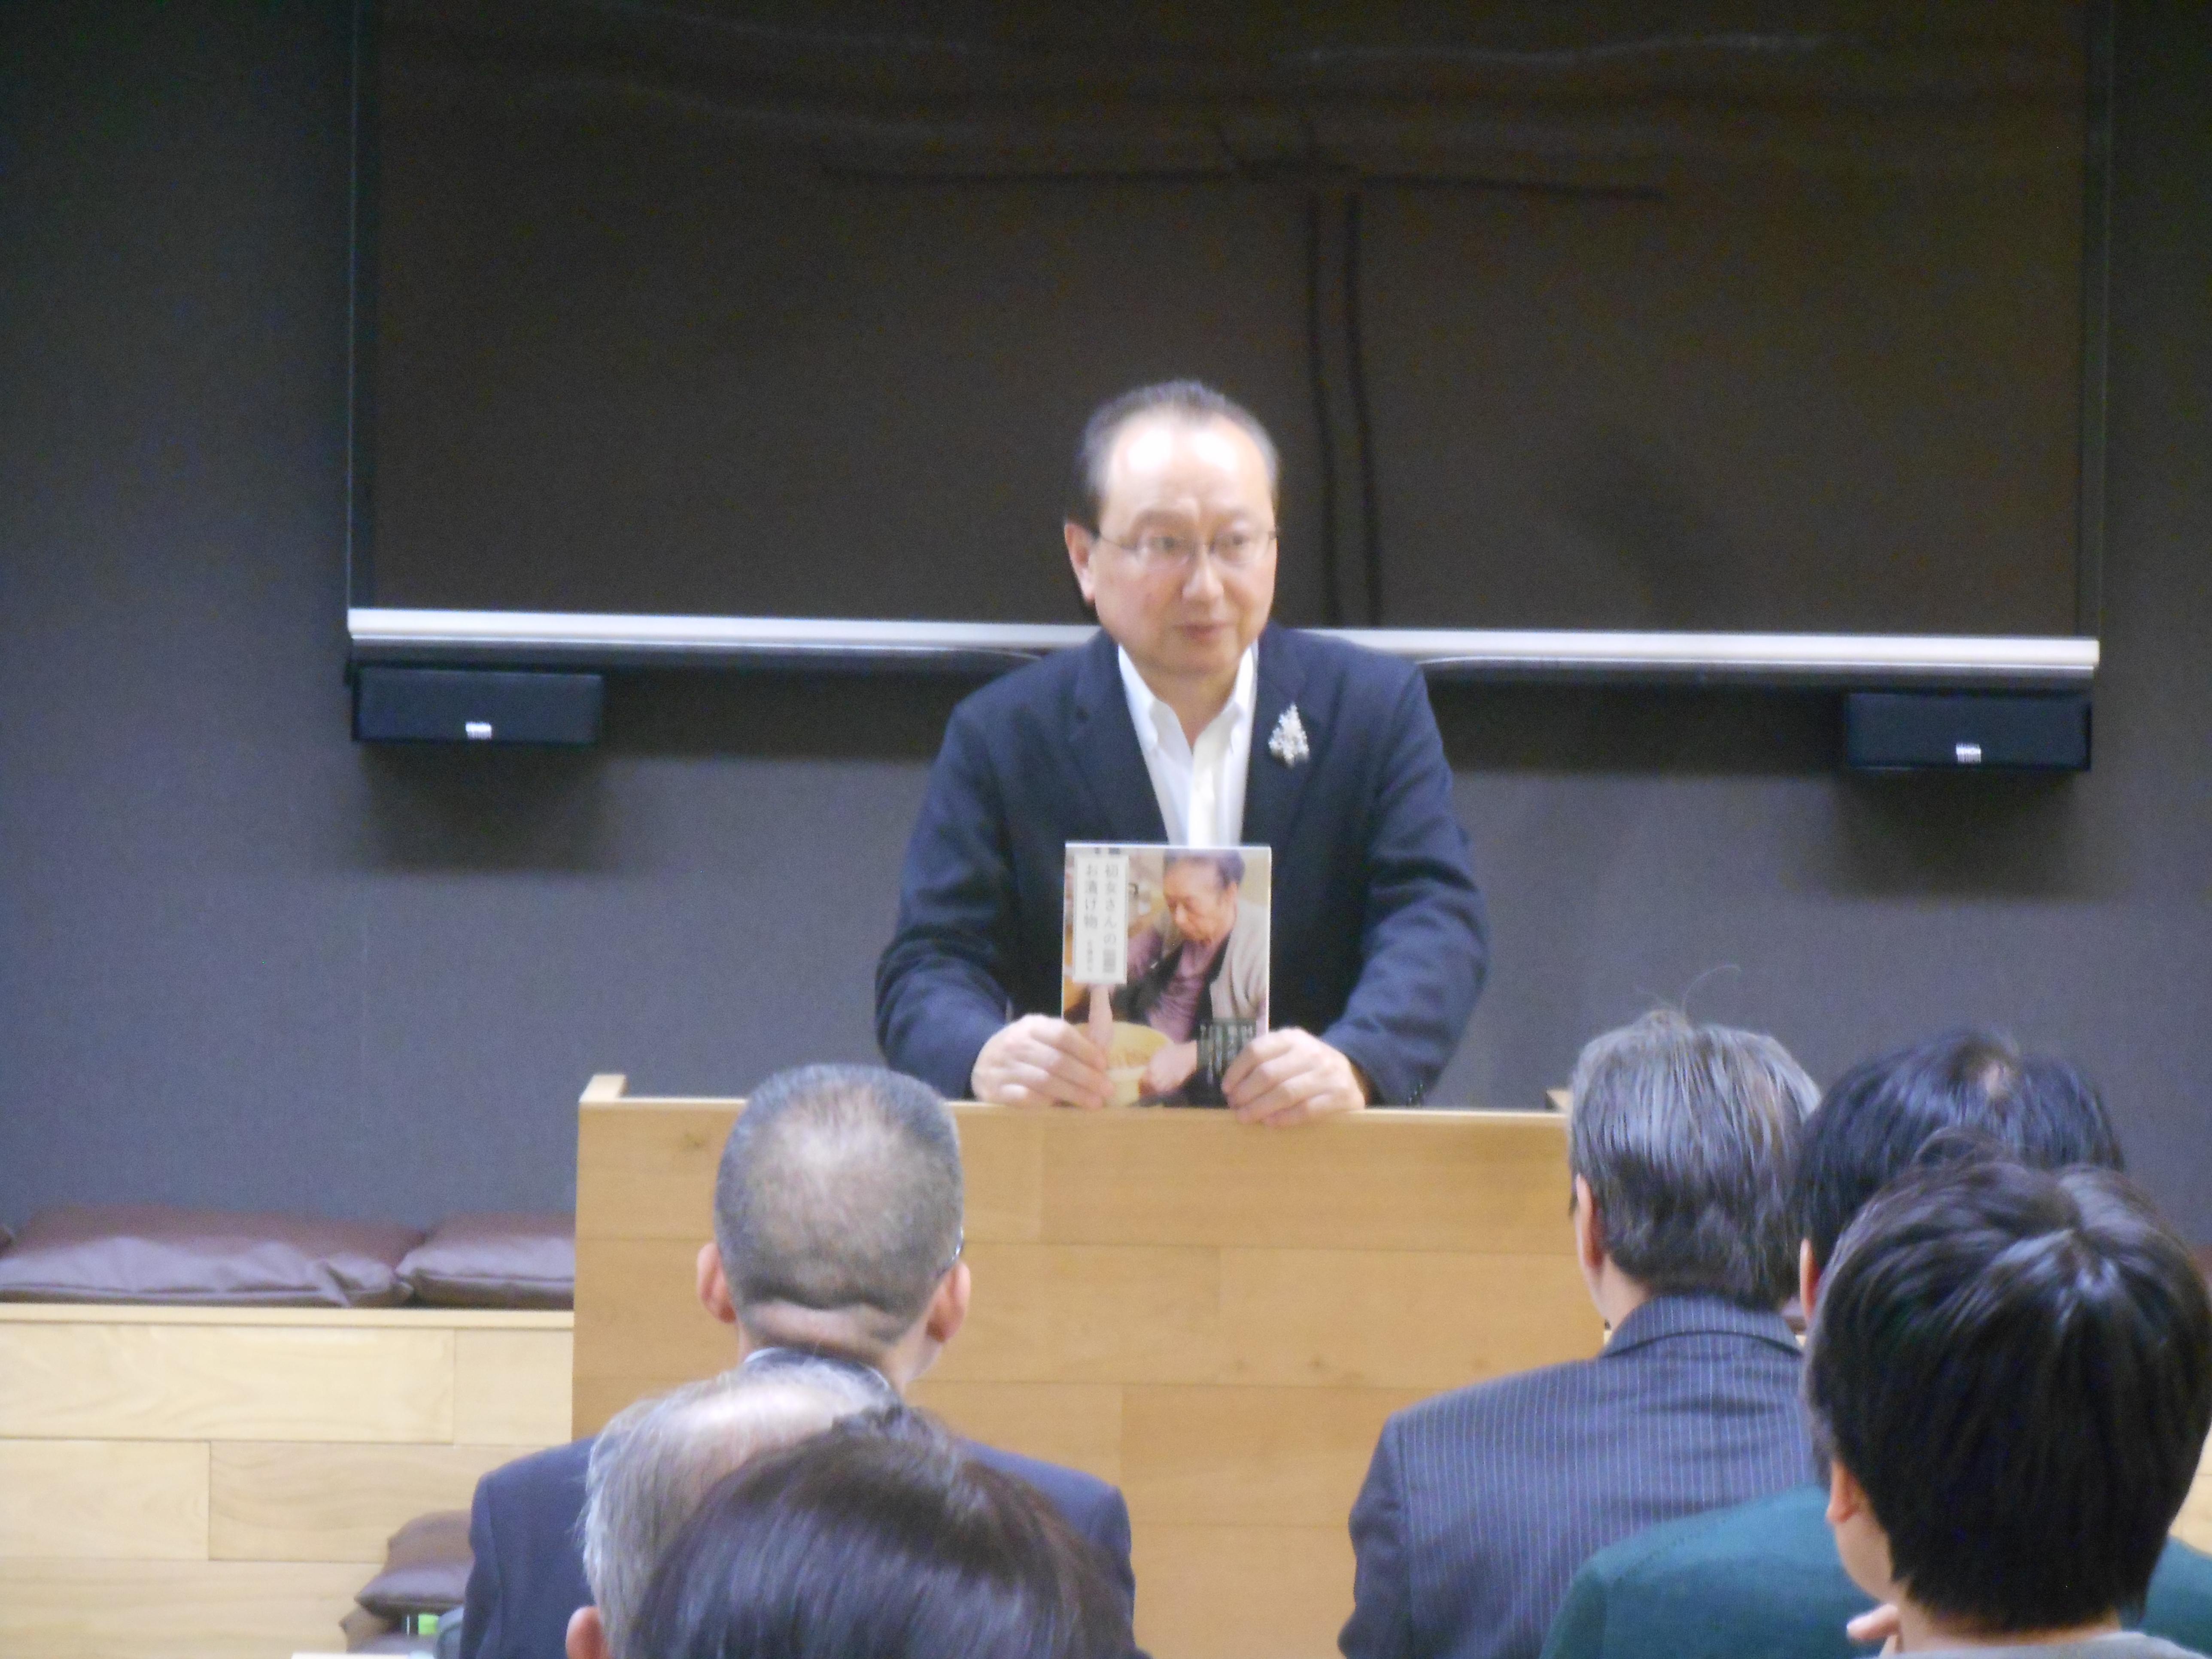 DSCN2286 - 4月1日東京思風塾の開催になります。